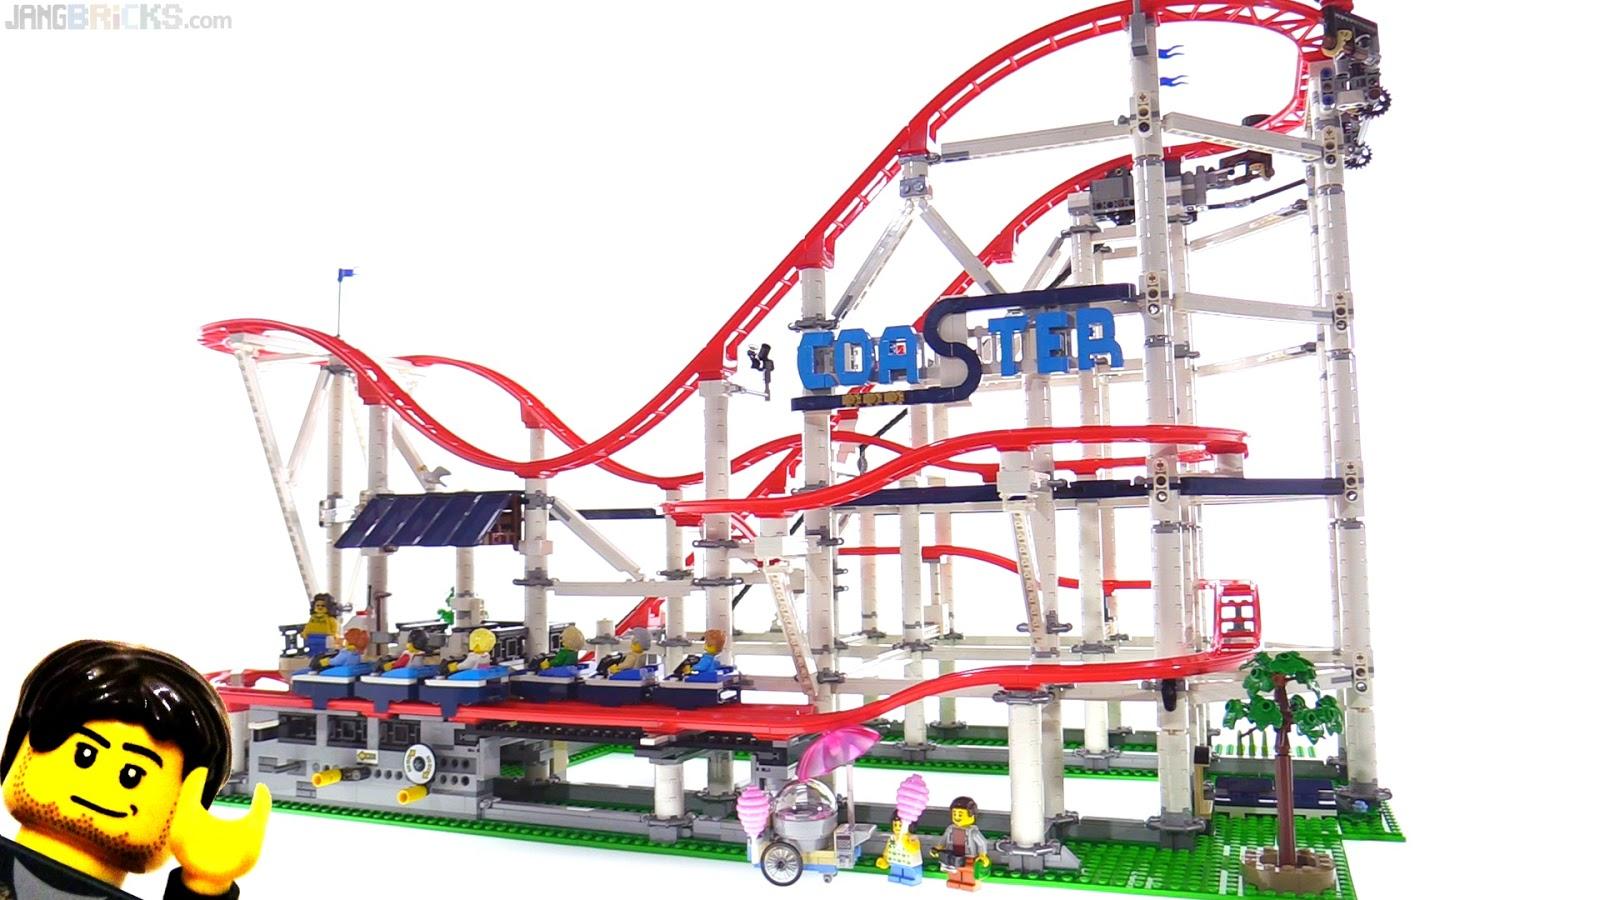 lego creator expert roller coaster build review videos. Black Bedroom Furniture Sets. Home Design Ideas